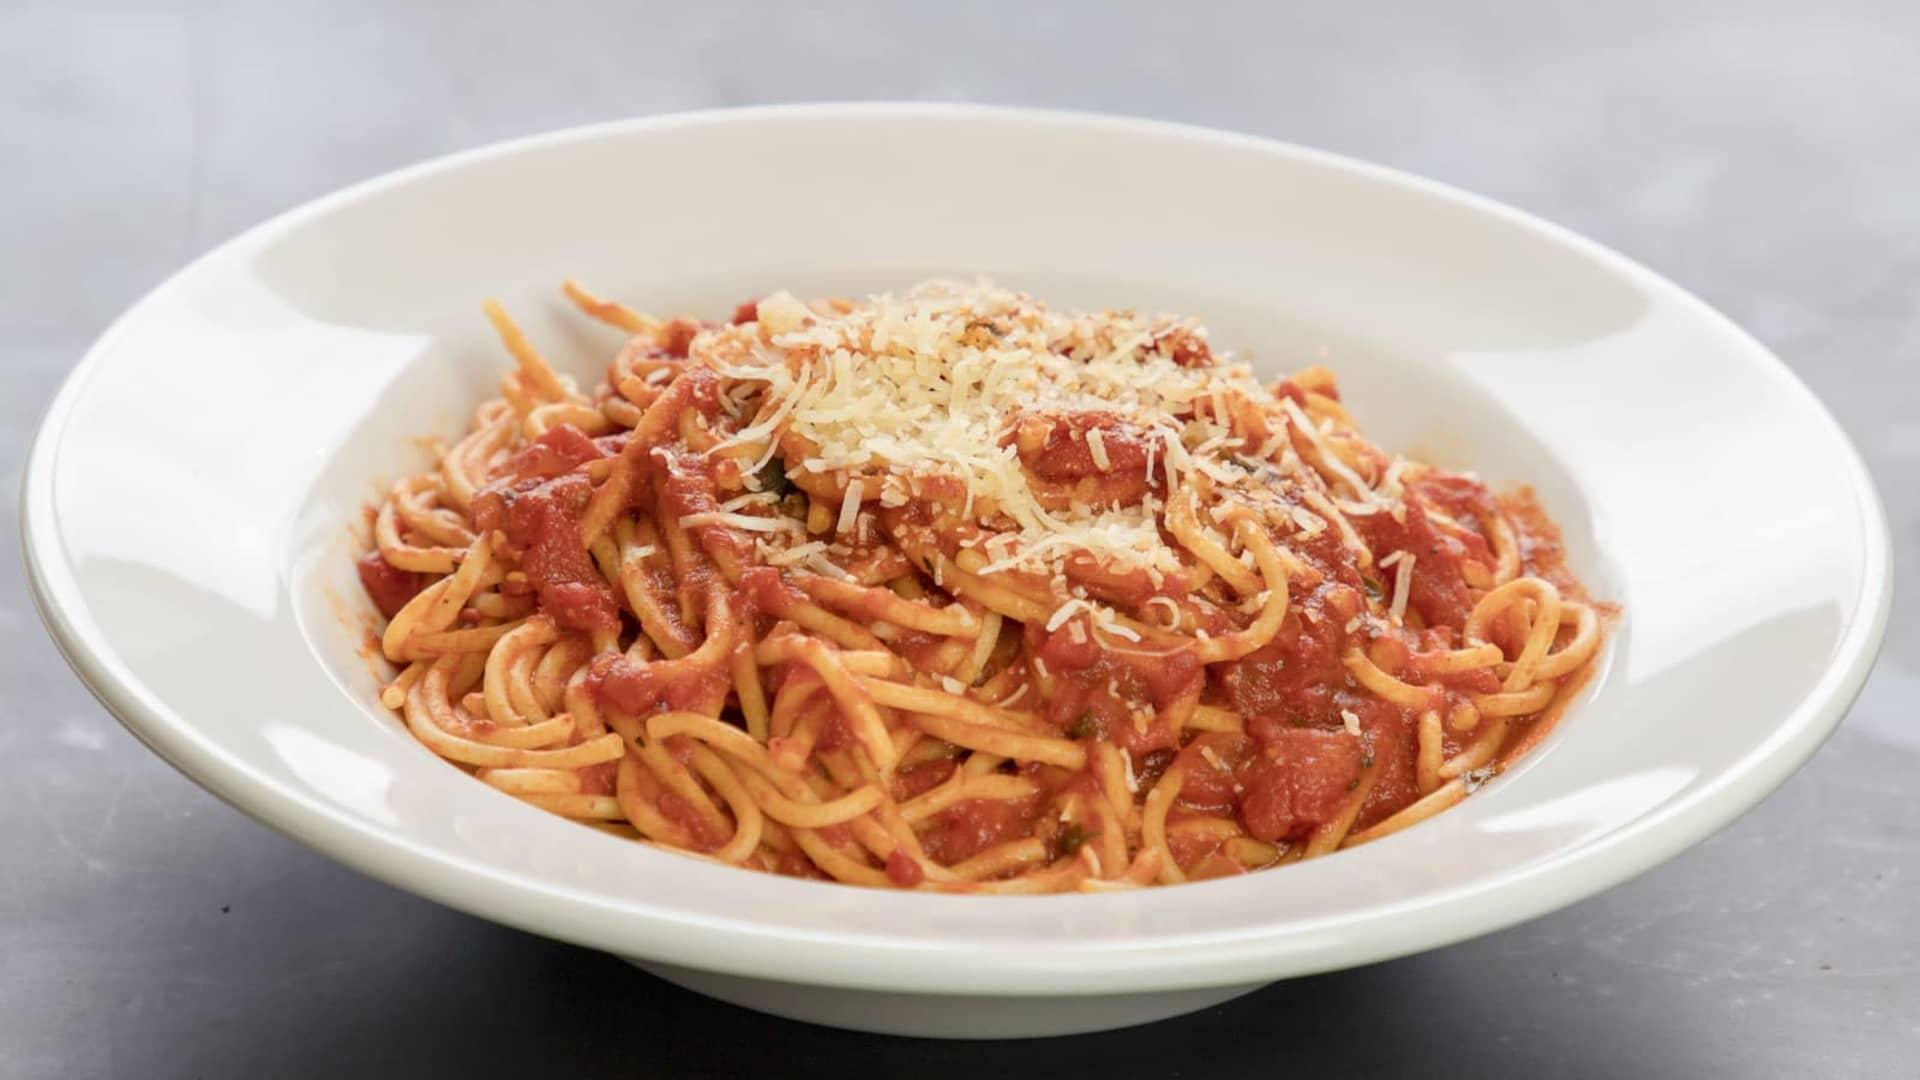 Spaghetti-An All American Classic